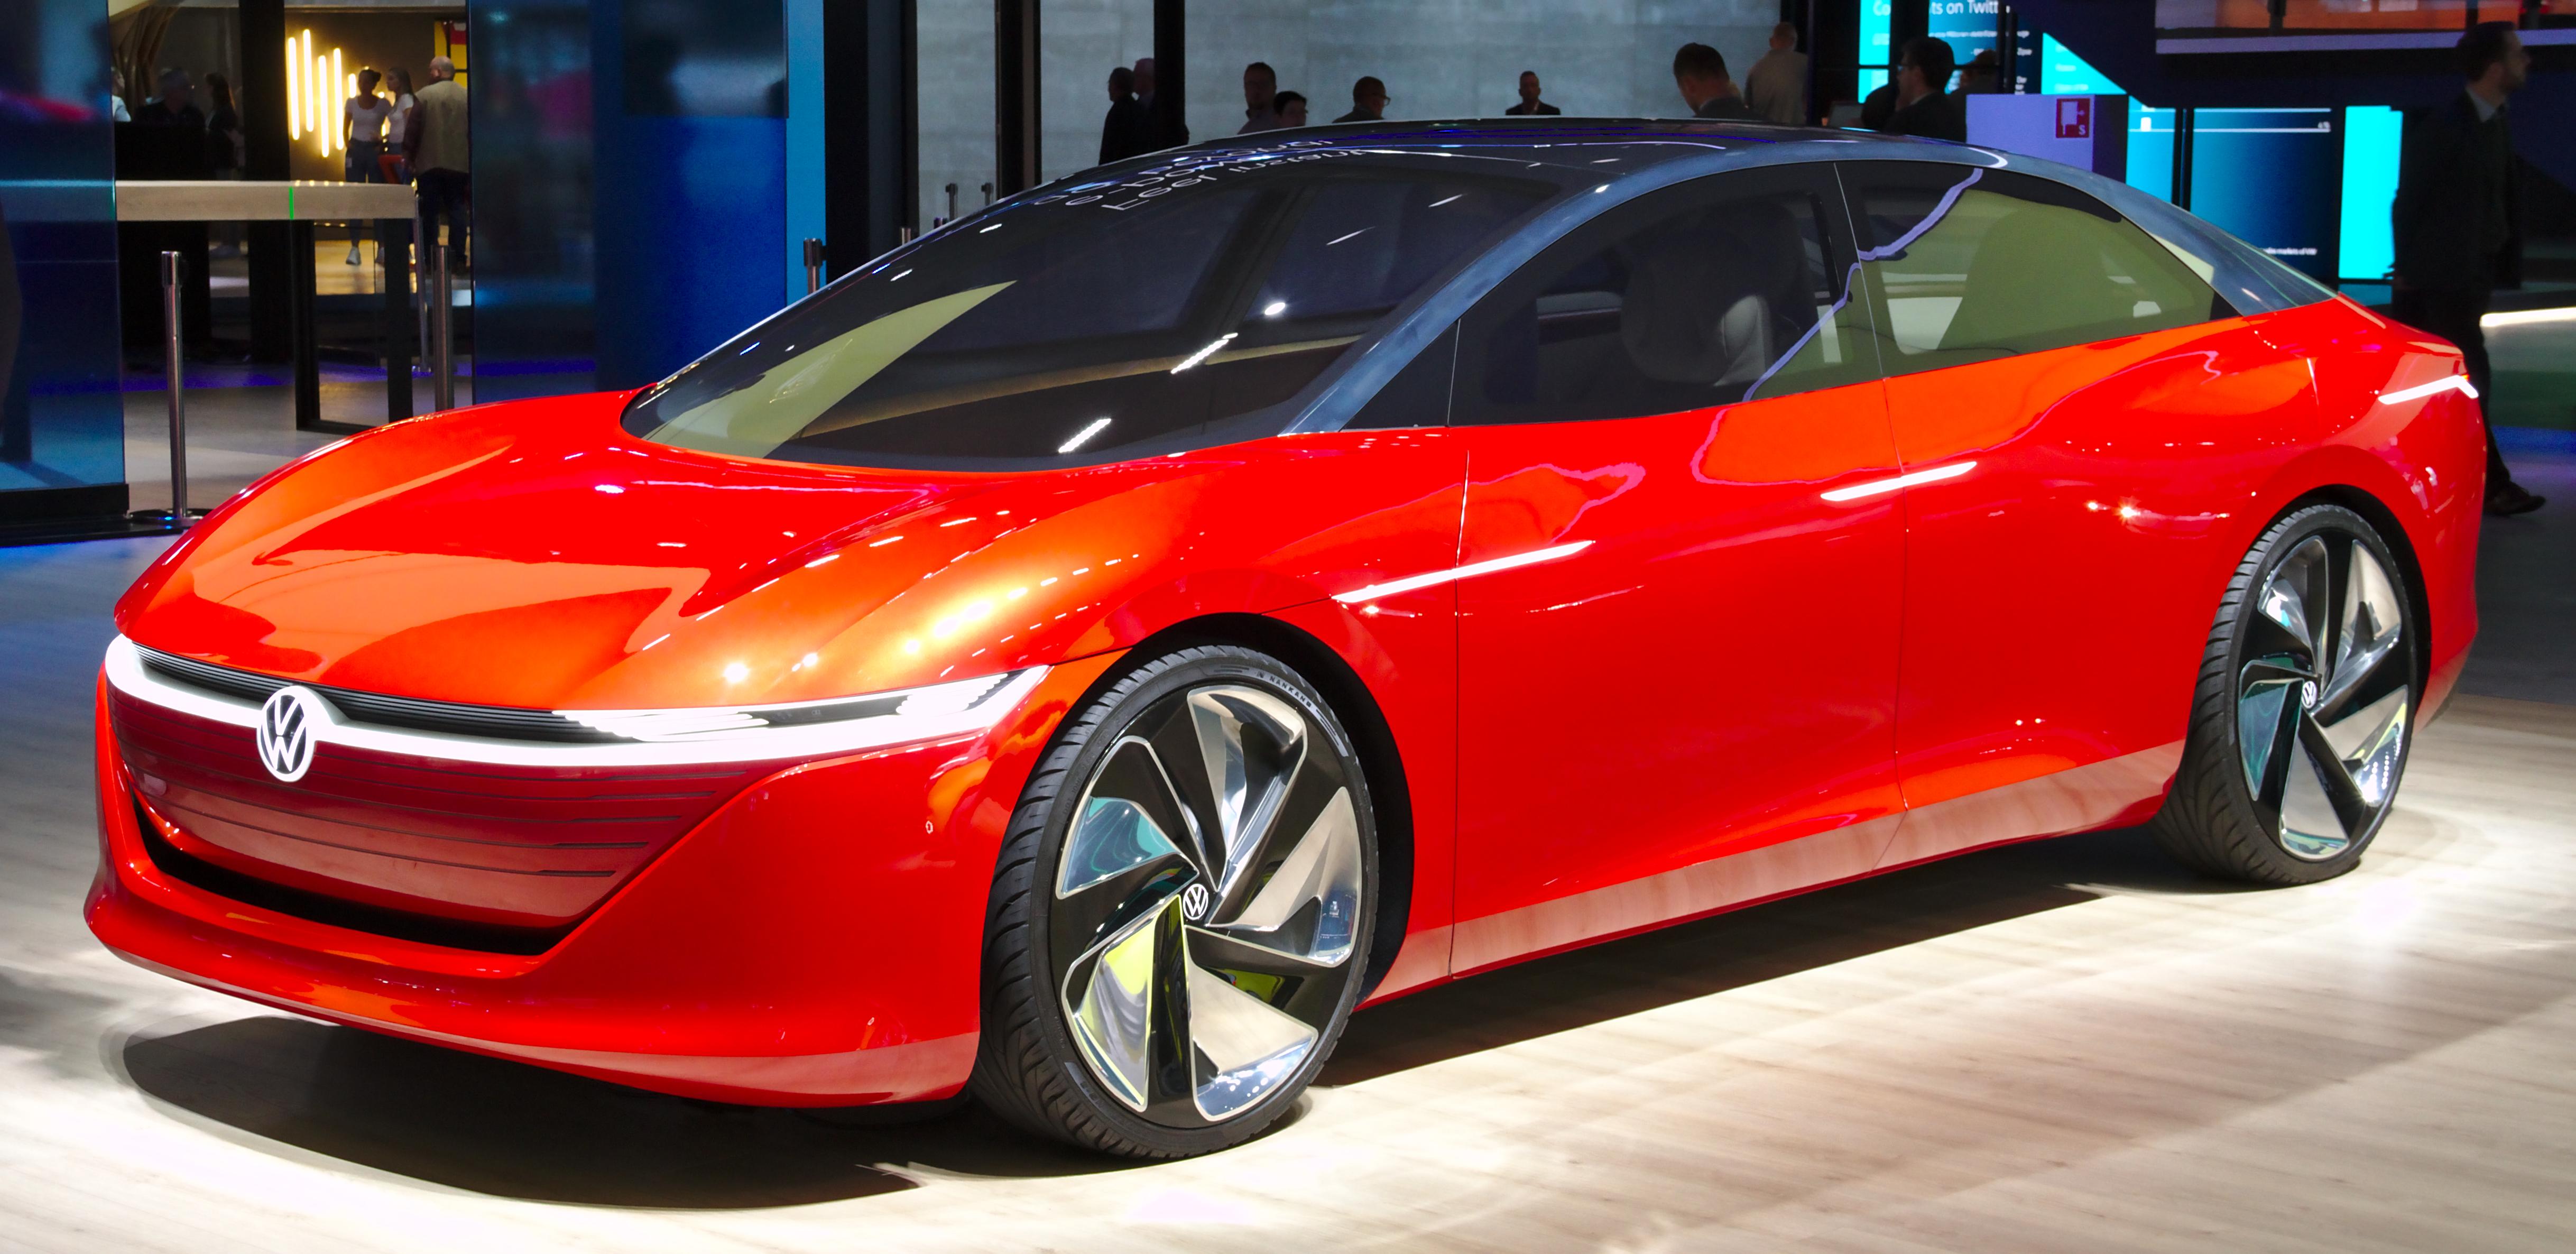 Volkswagen I.D. Vizzion - Wikipedia